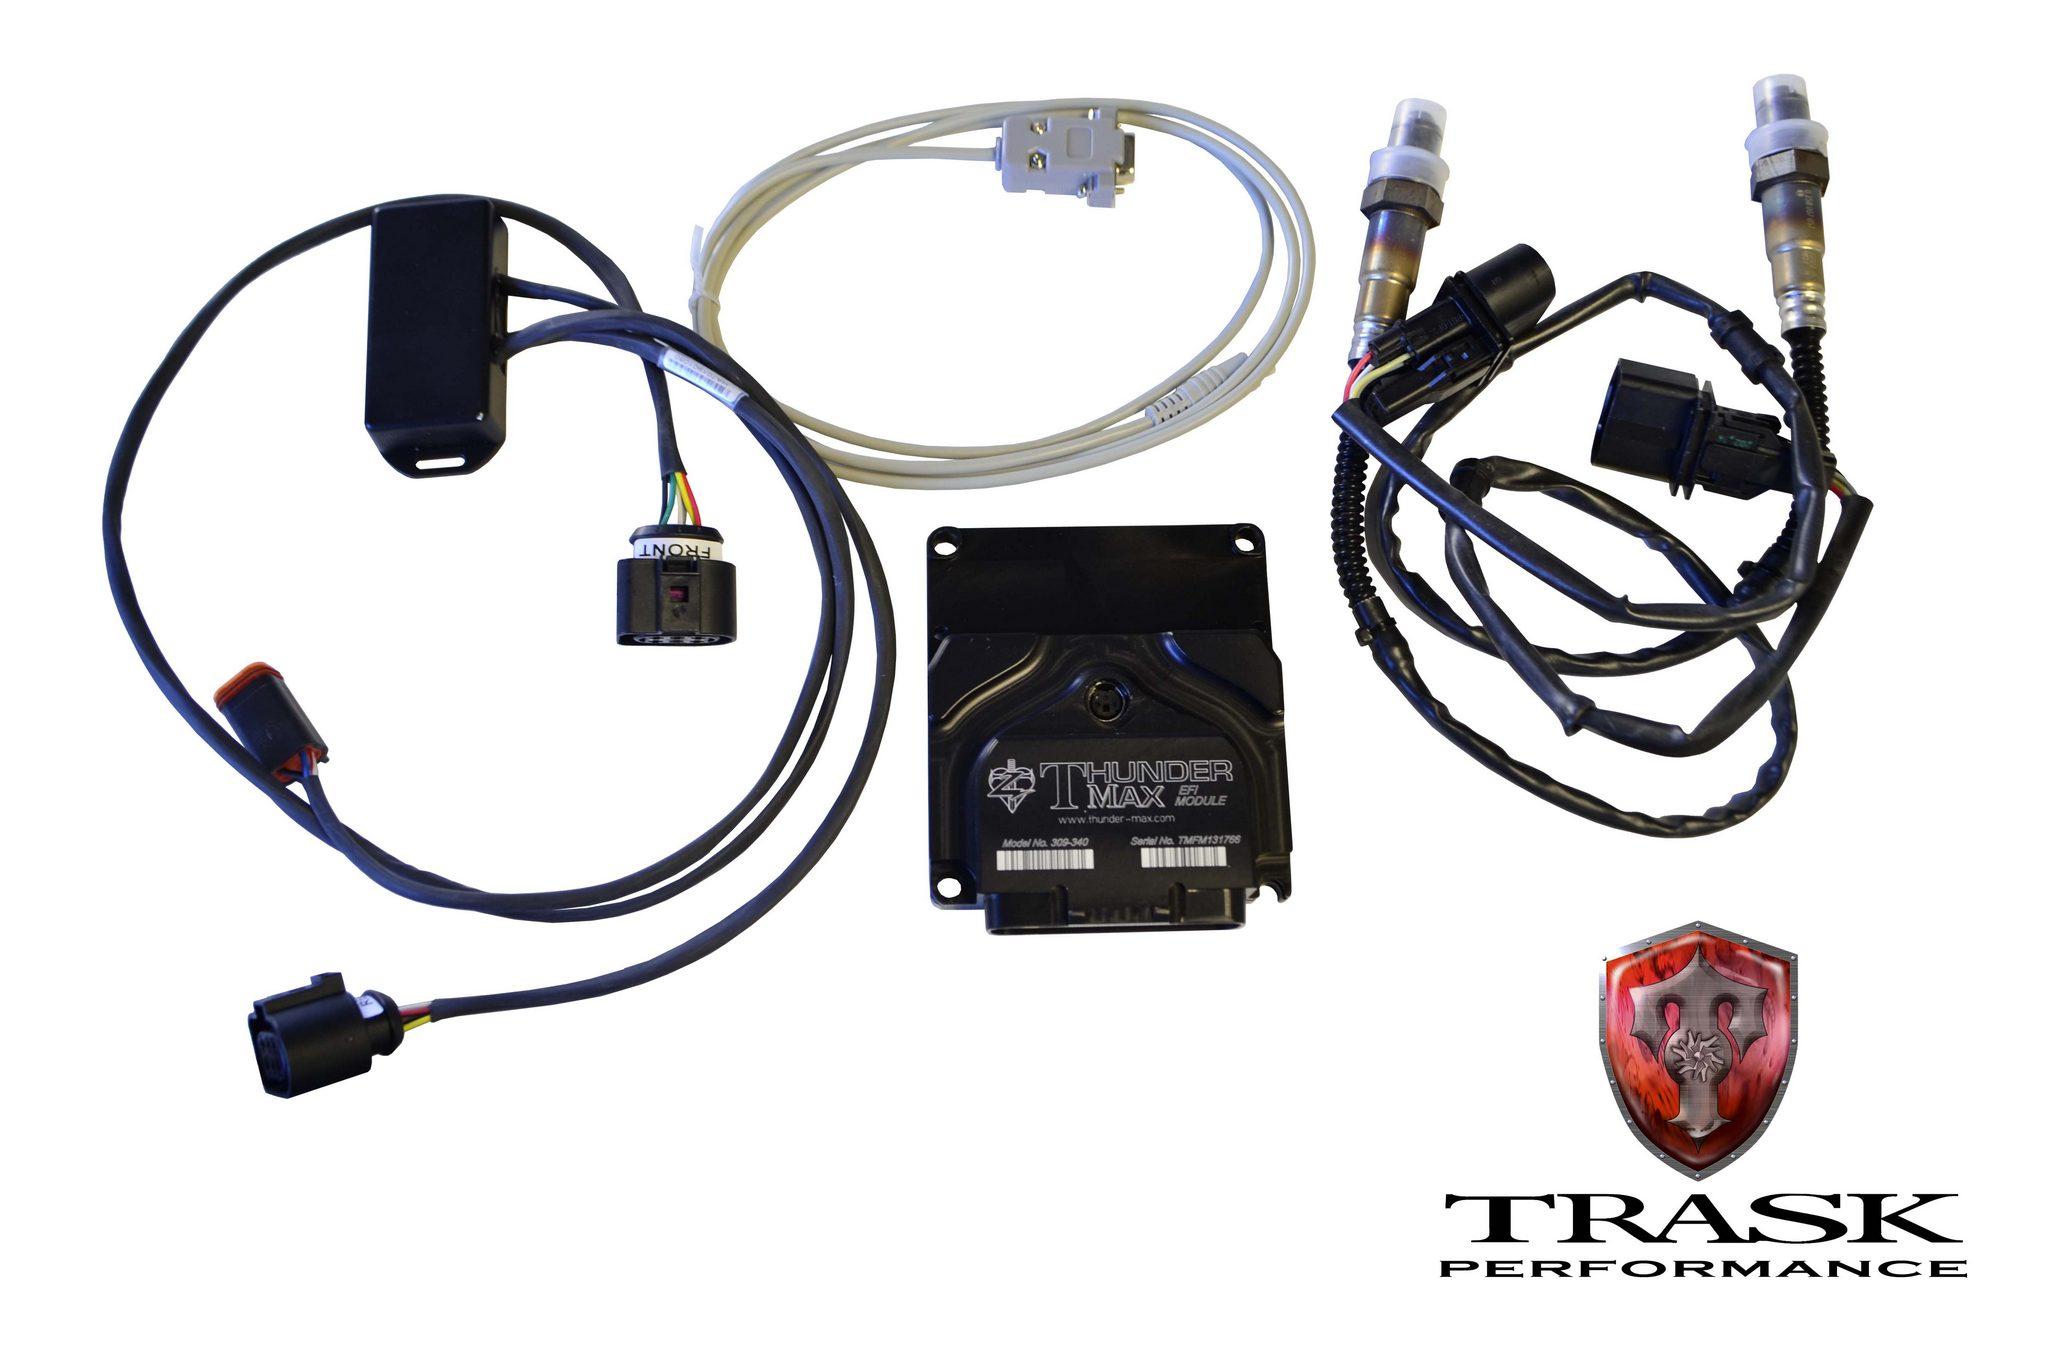 Trask Performance Turbo Kits for EFI Harley Baggers - autoevolution